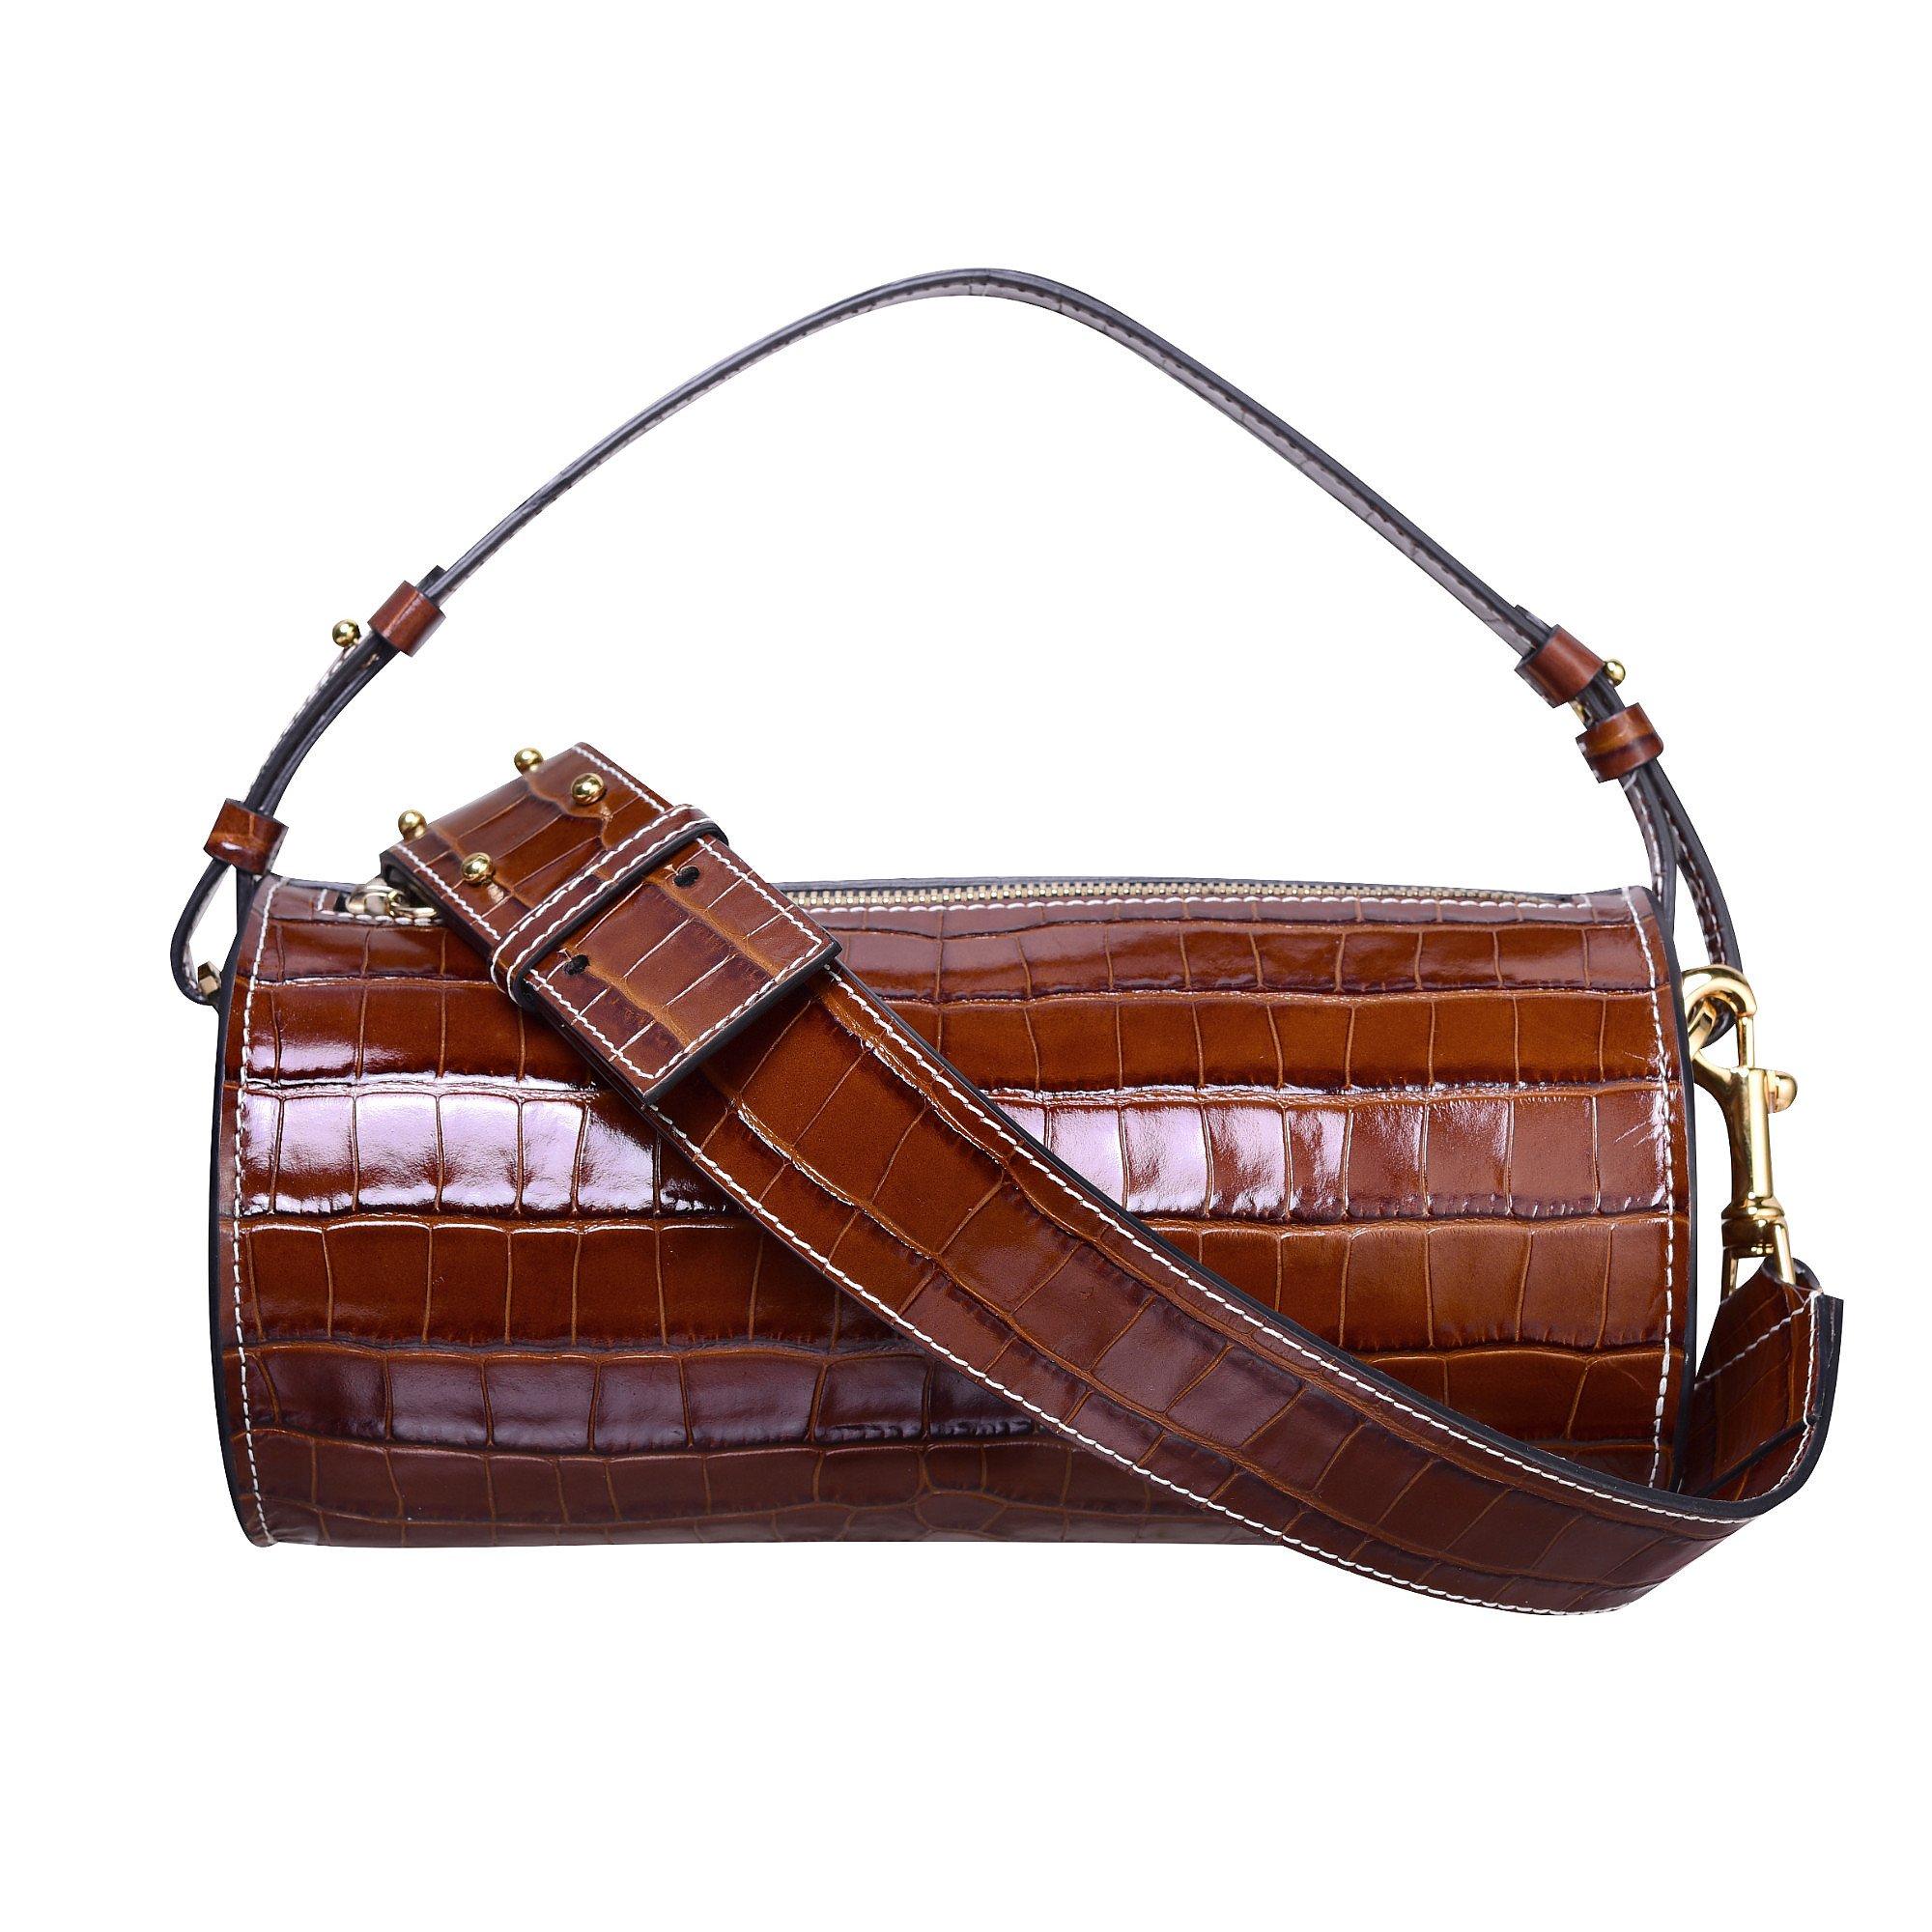 C.Nicol Evie Croc-Stamped Barrel Bag